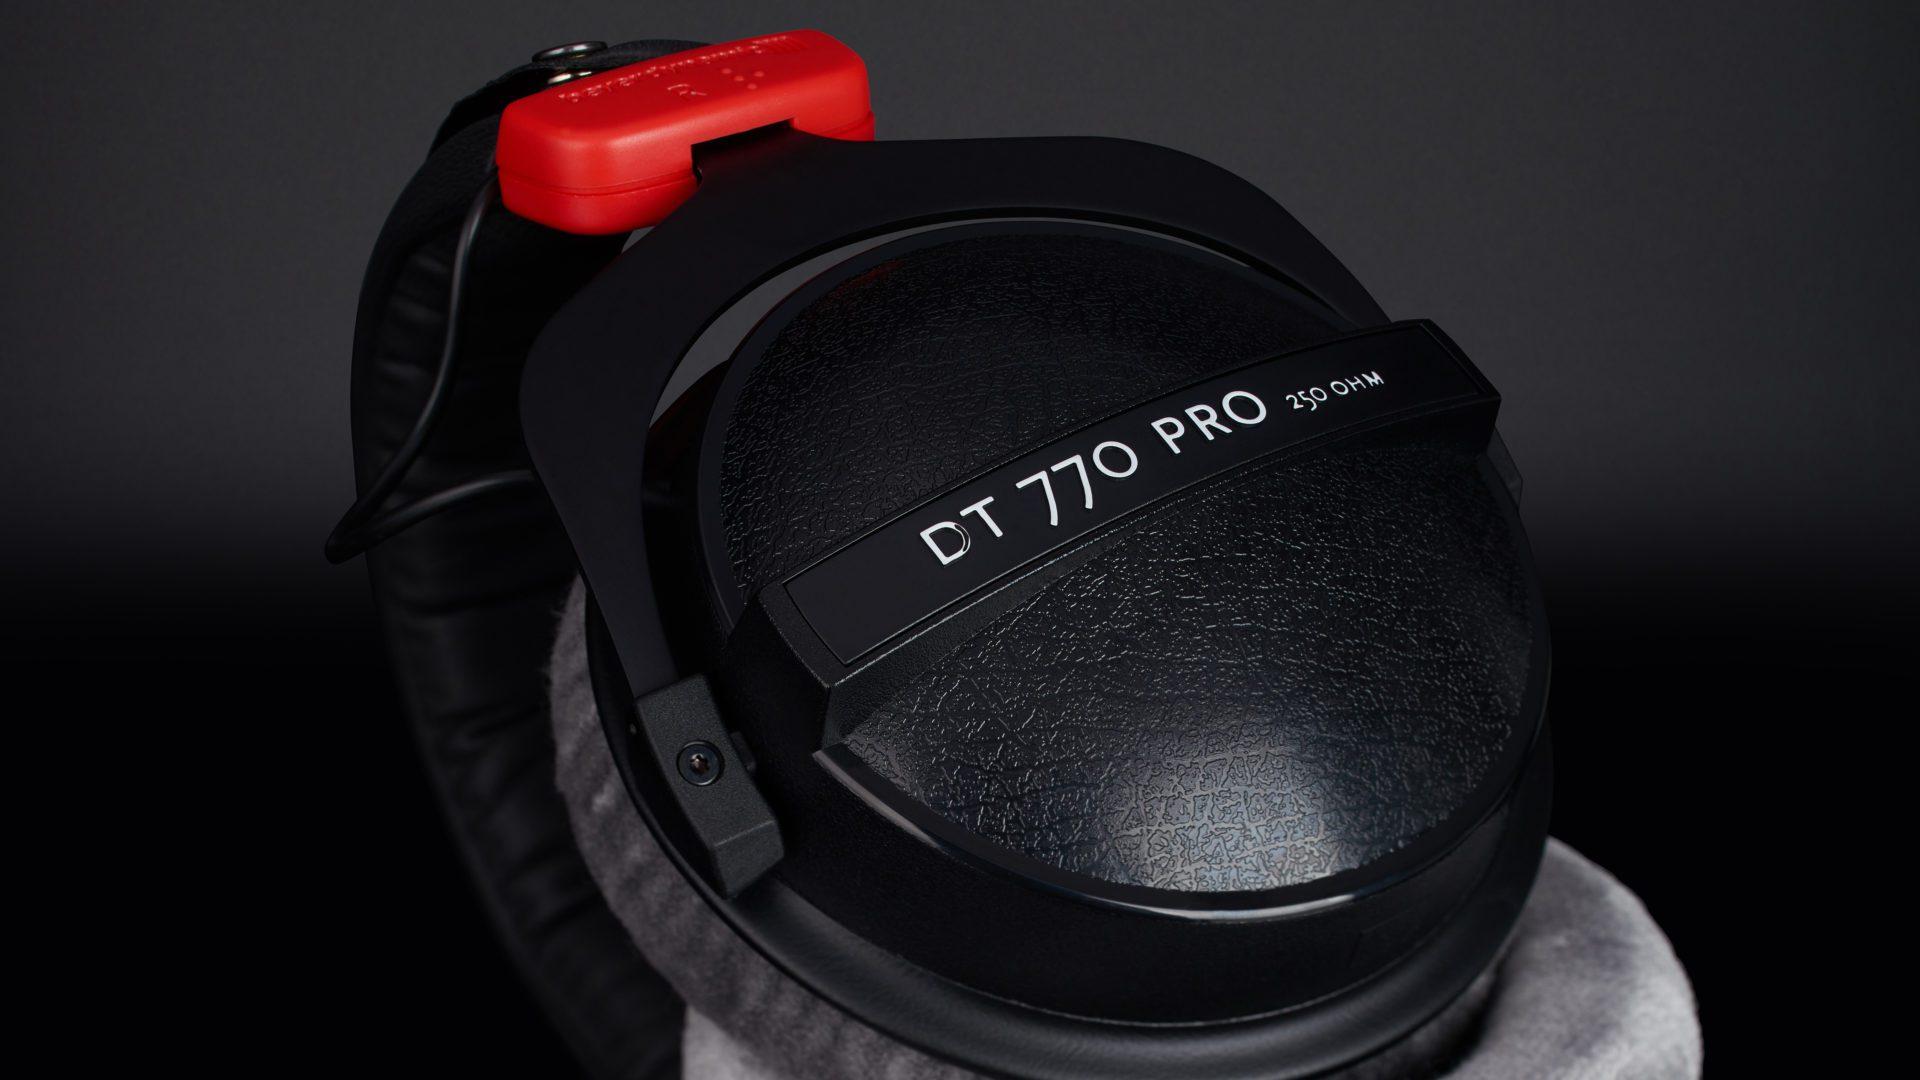 Beyerdynamic DT 770 Pro LTD/250 Ohm